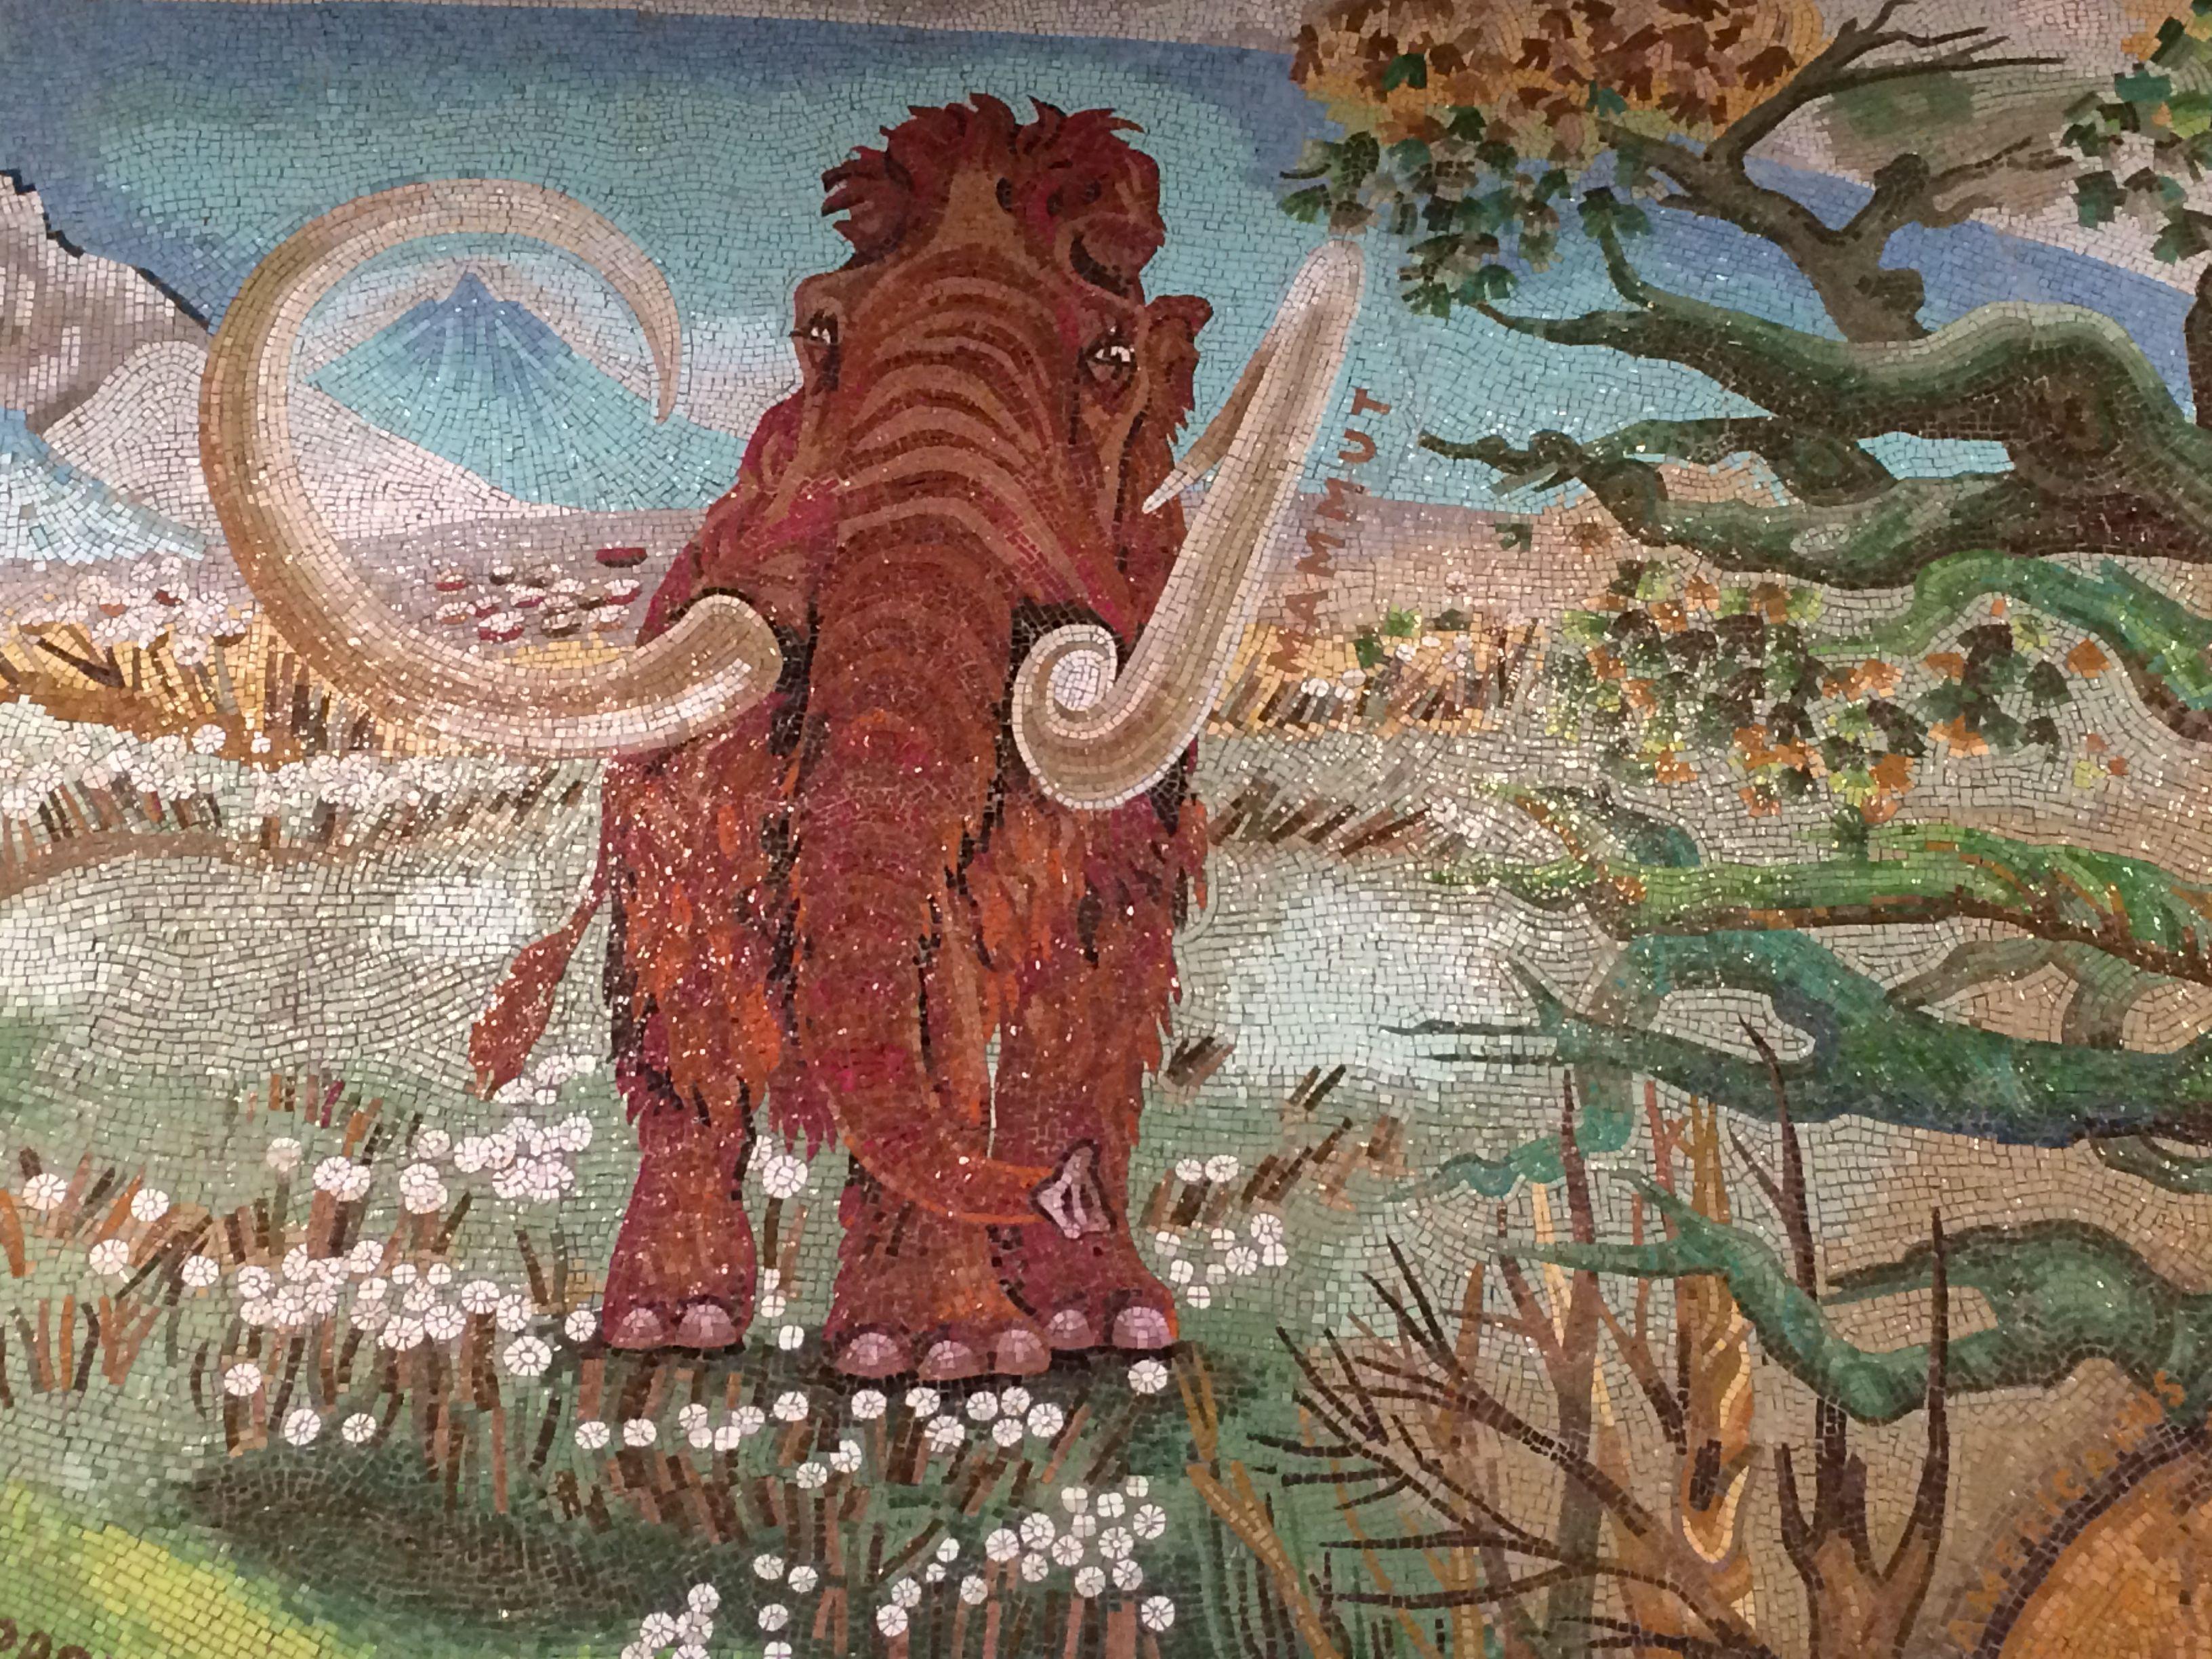 Mosaik Berlin mosaik im tierpark friedrichsfelde berlin teil eines großen